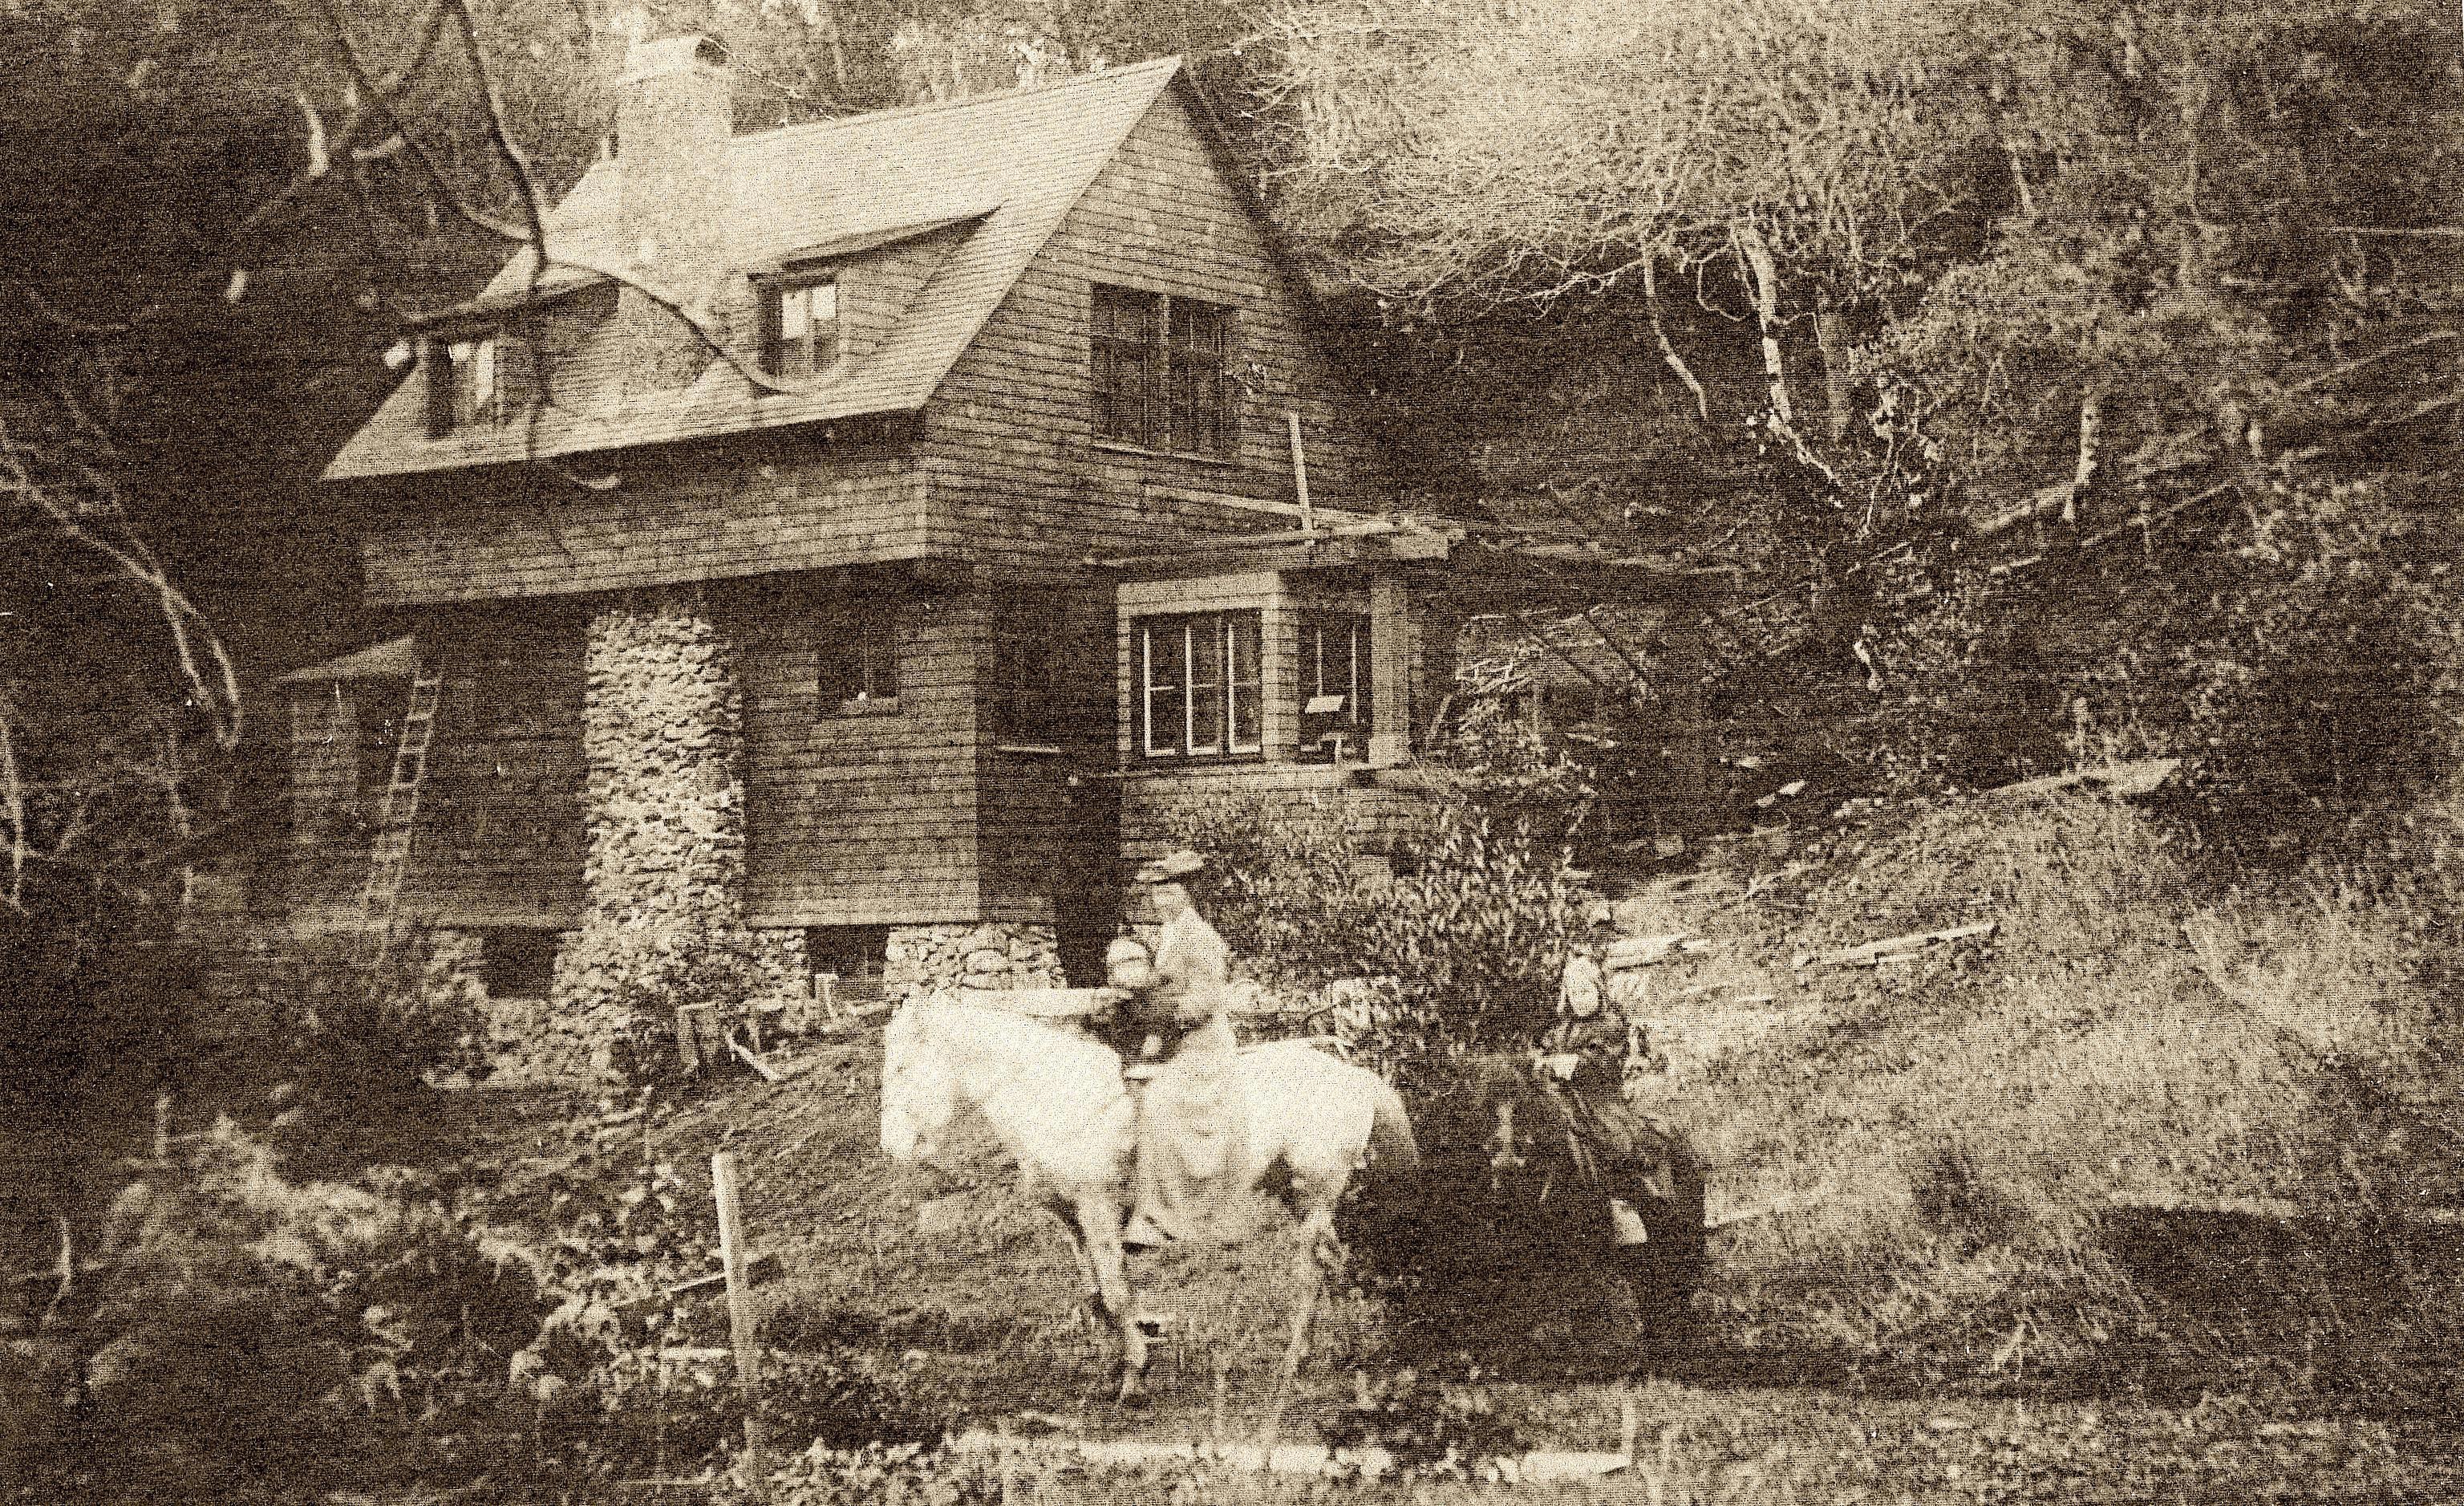 Eels House - 1908